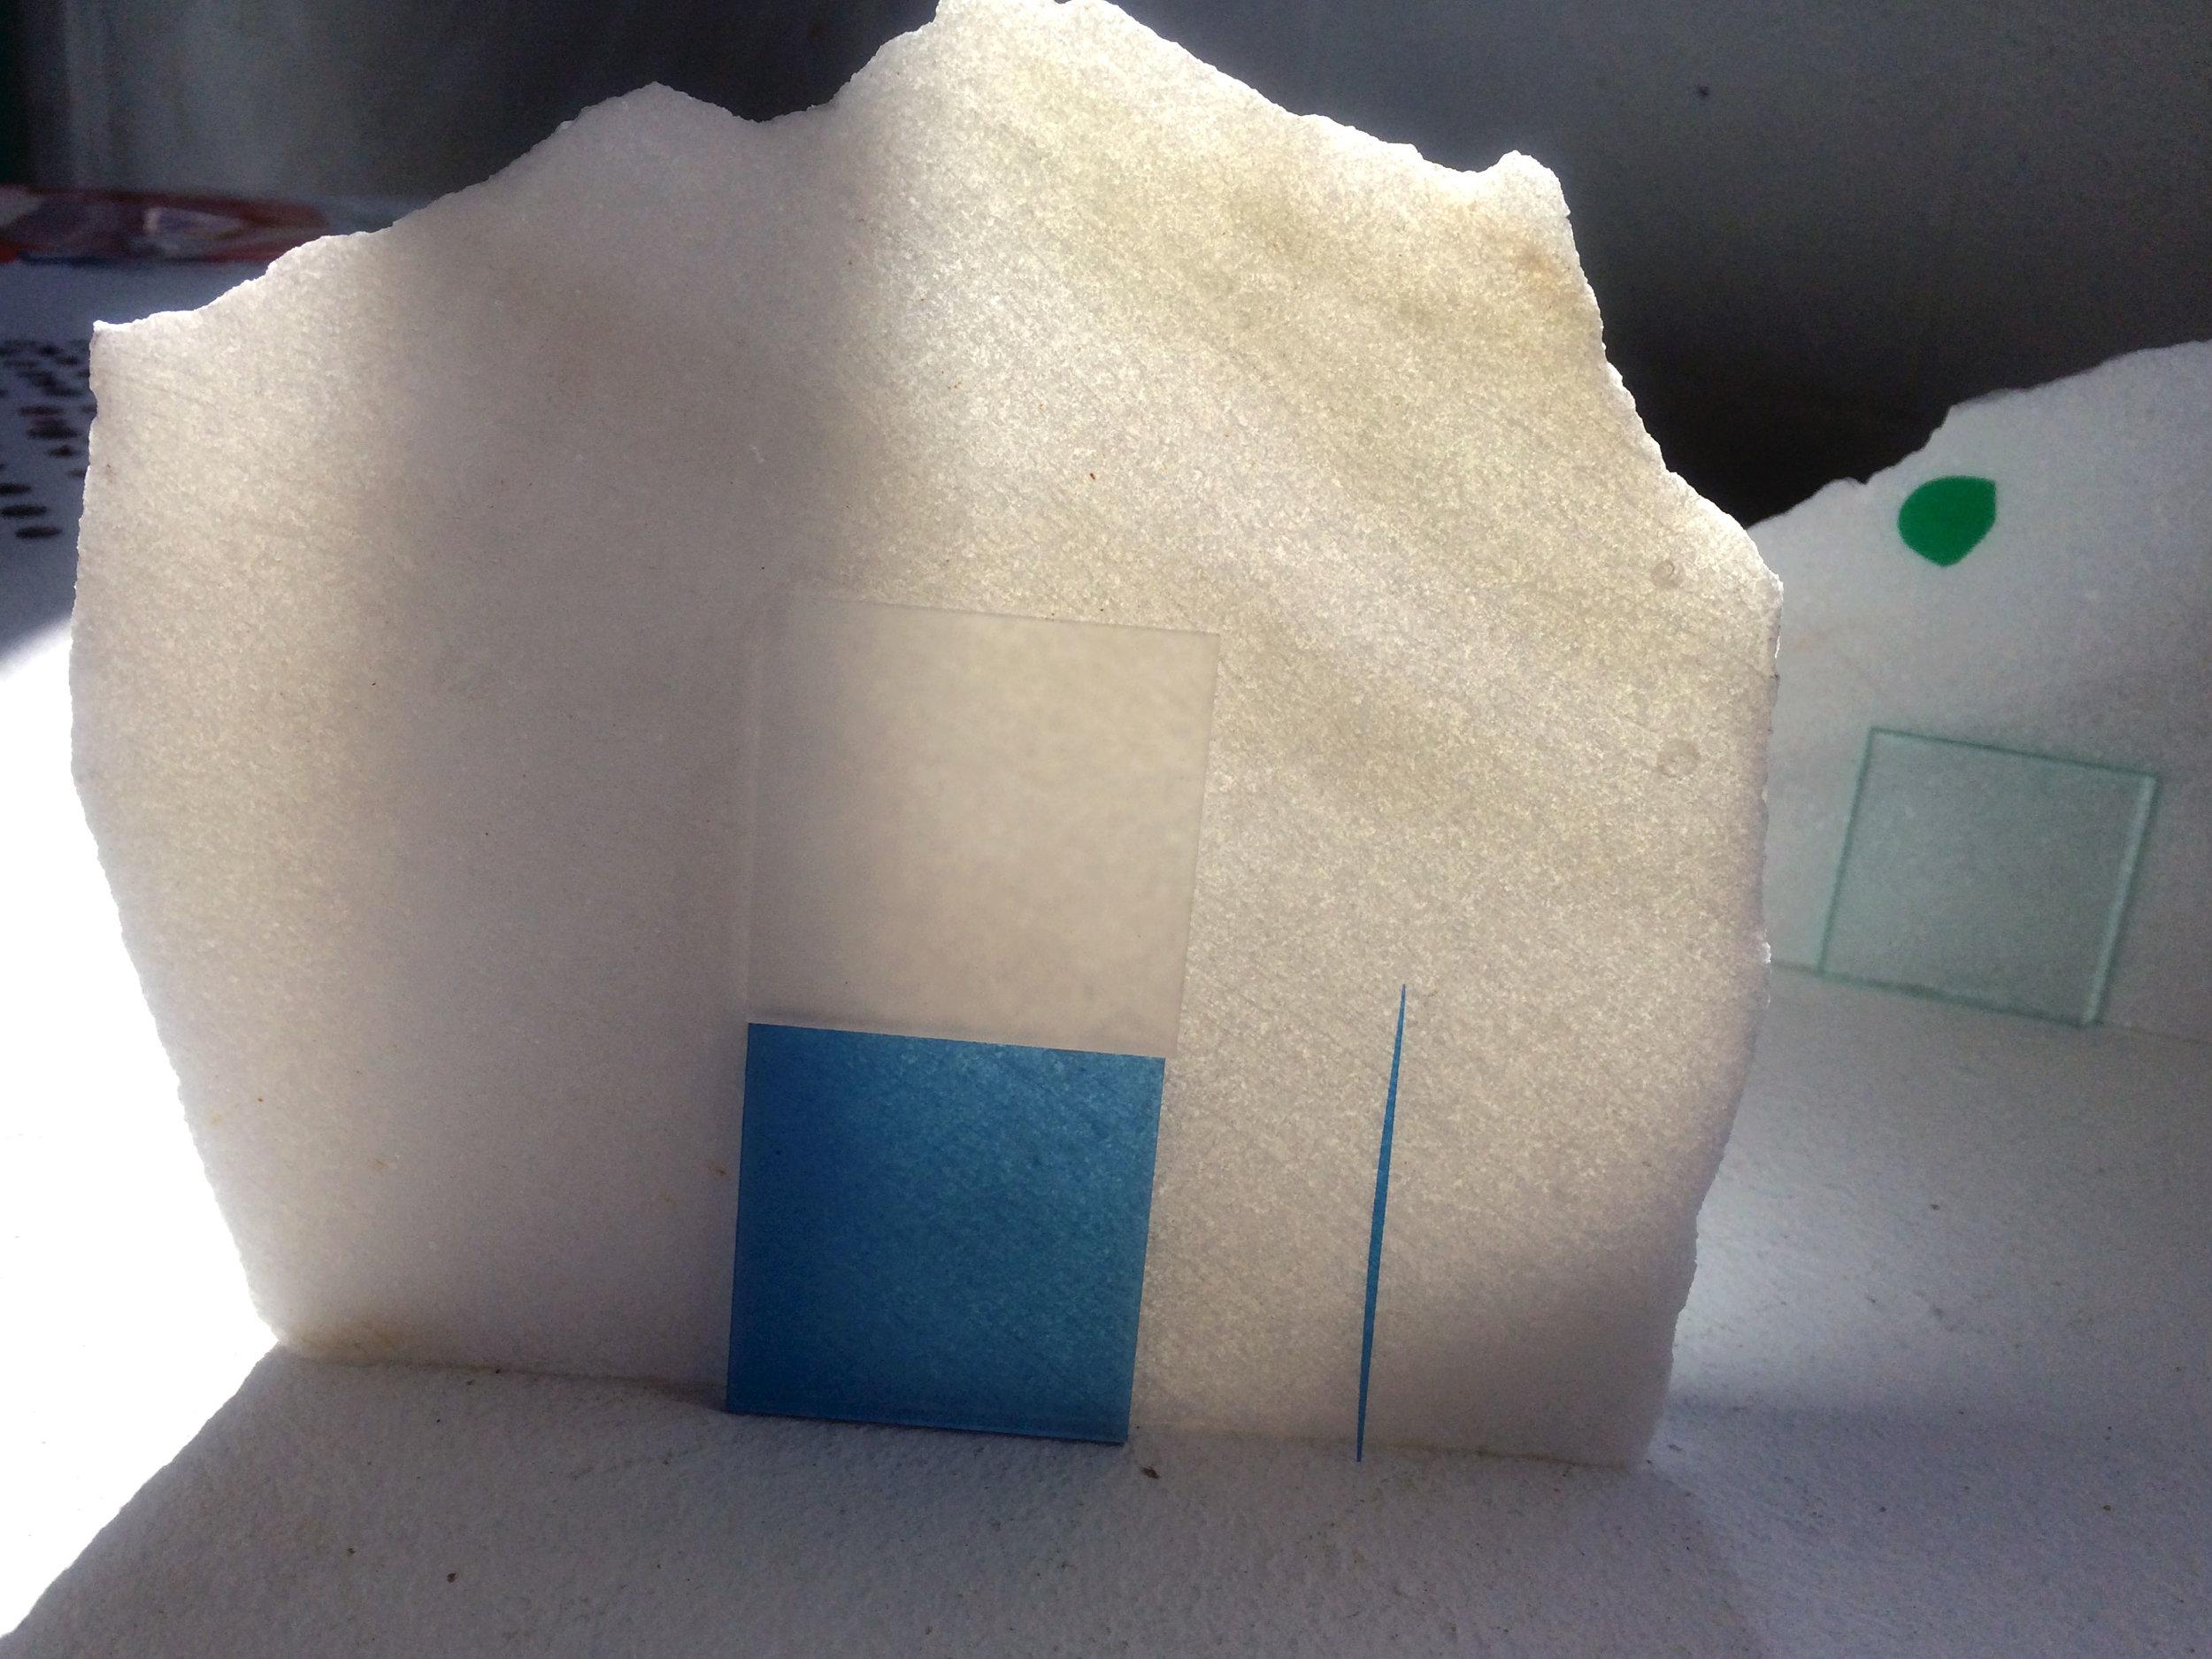 Detail:  Landscape II,  Danby Marble, Plexiglass and Foil, 2016